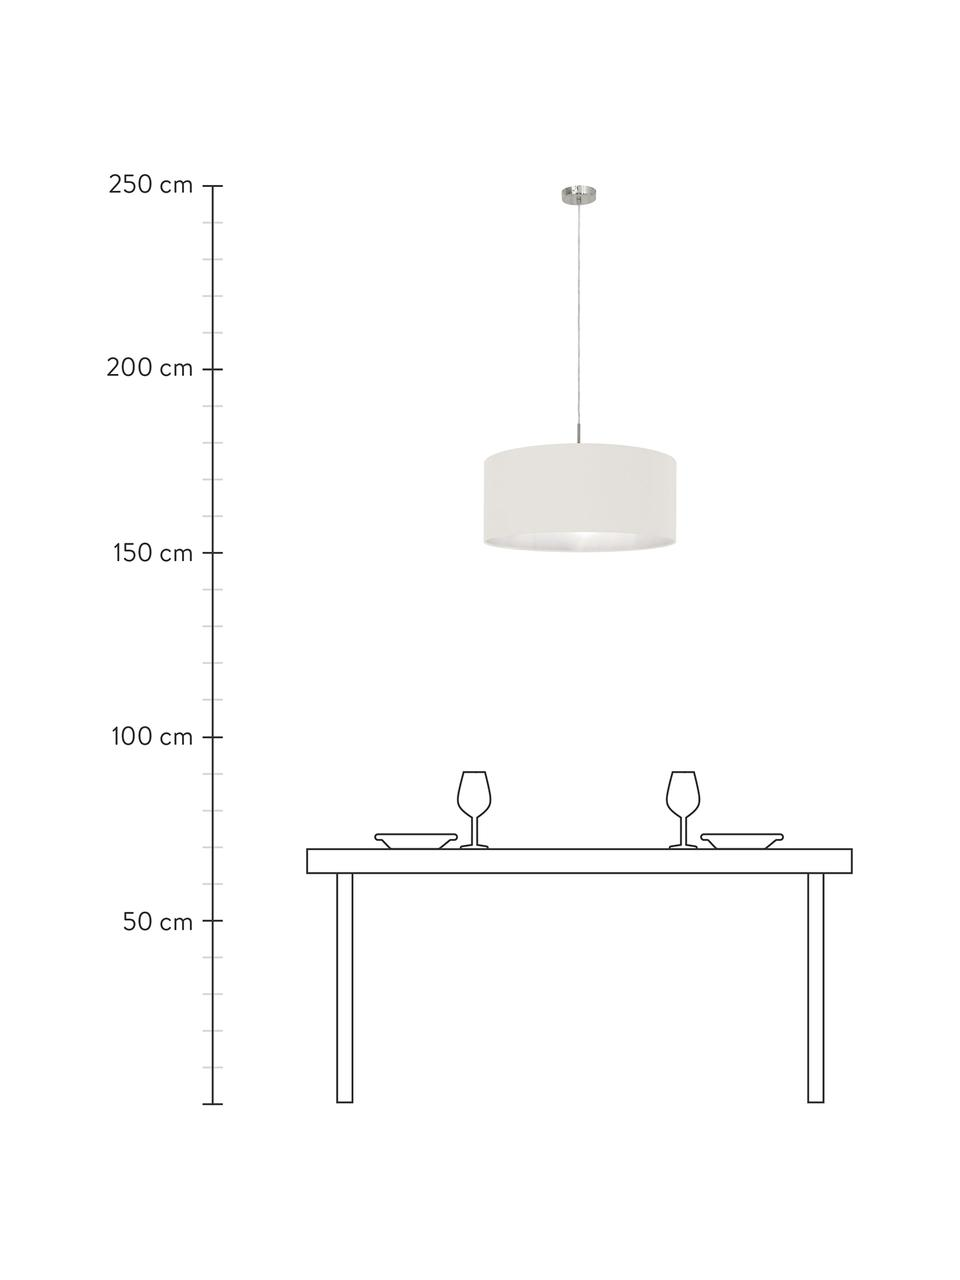 Pendelleuchte Parry, Lampenschirm: Textil, Baldachin: Metall, vernickelt, Silberfarben, Cremeweiß, Ø 53 x H 25 cm